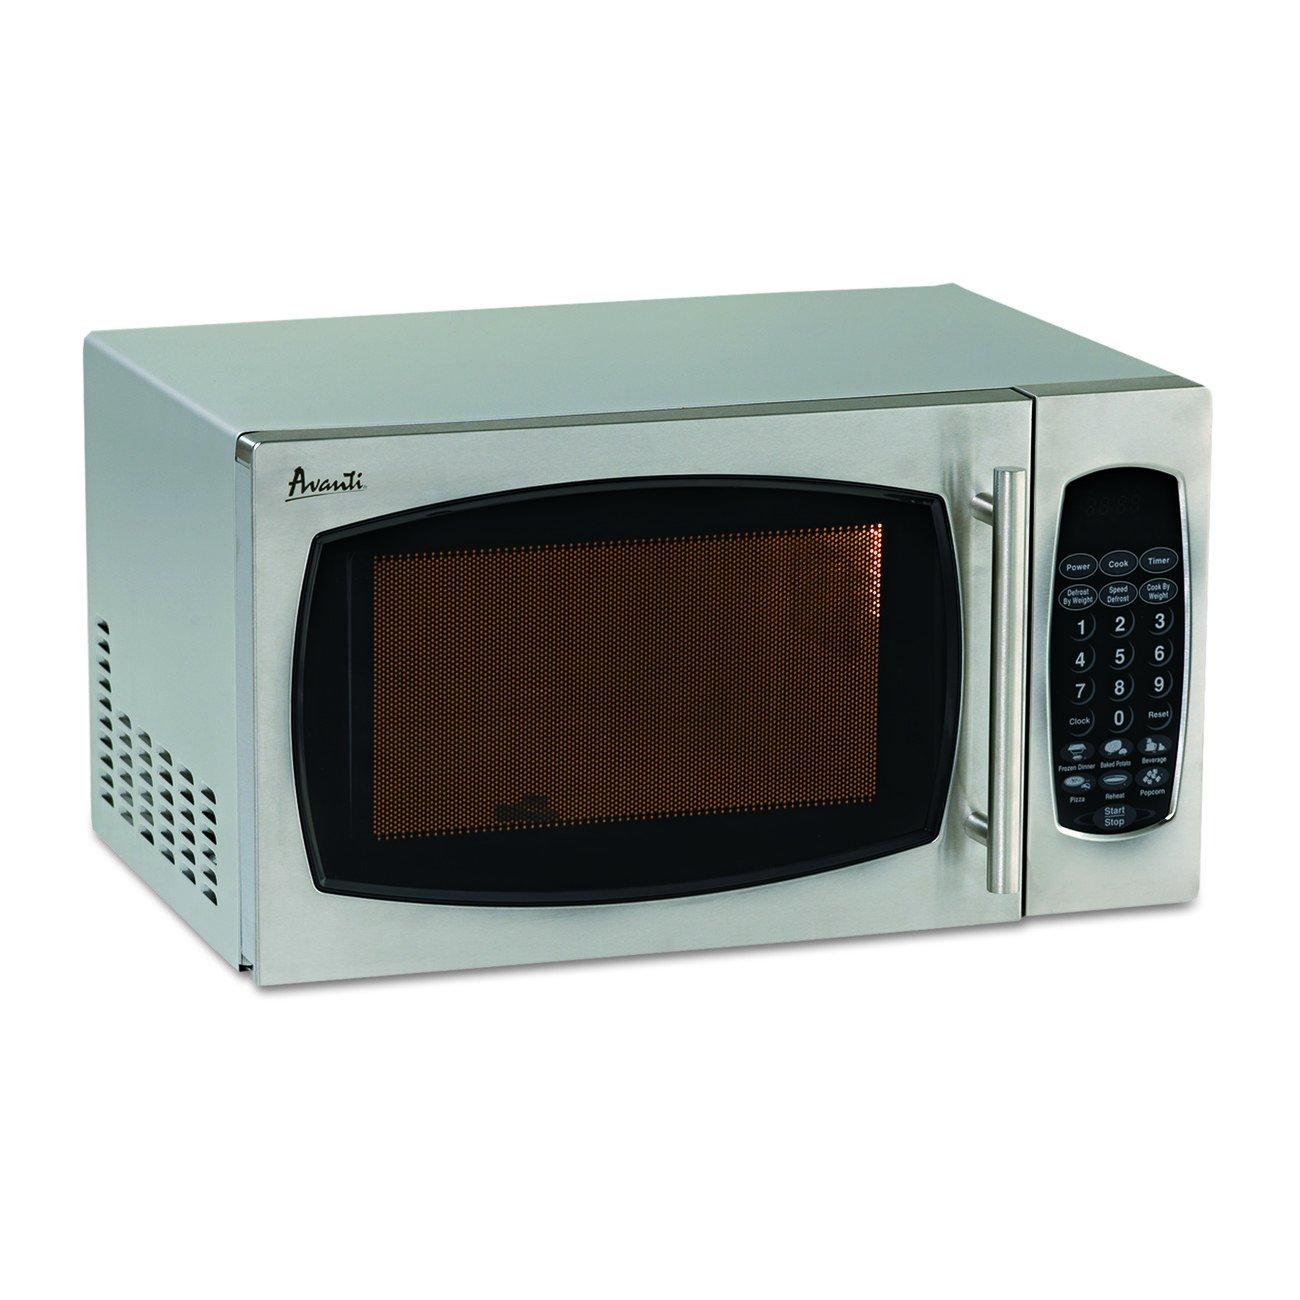 Amazon.com: Avanti AVAMO9003SST Microwave Oven, Stainless Steel ...